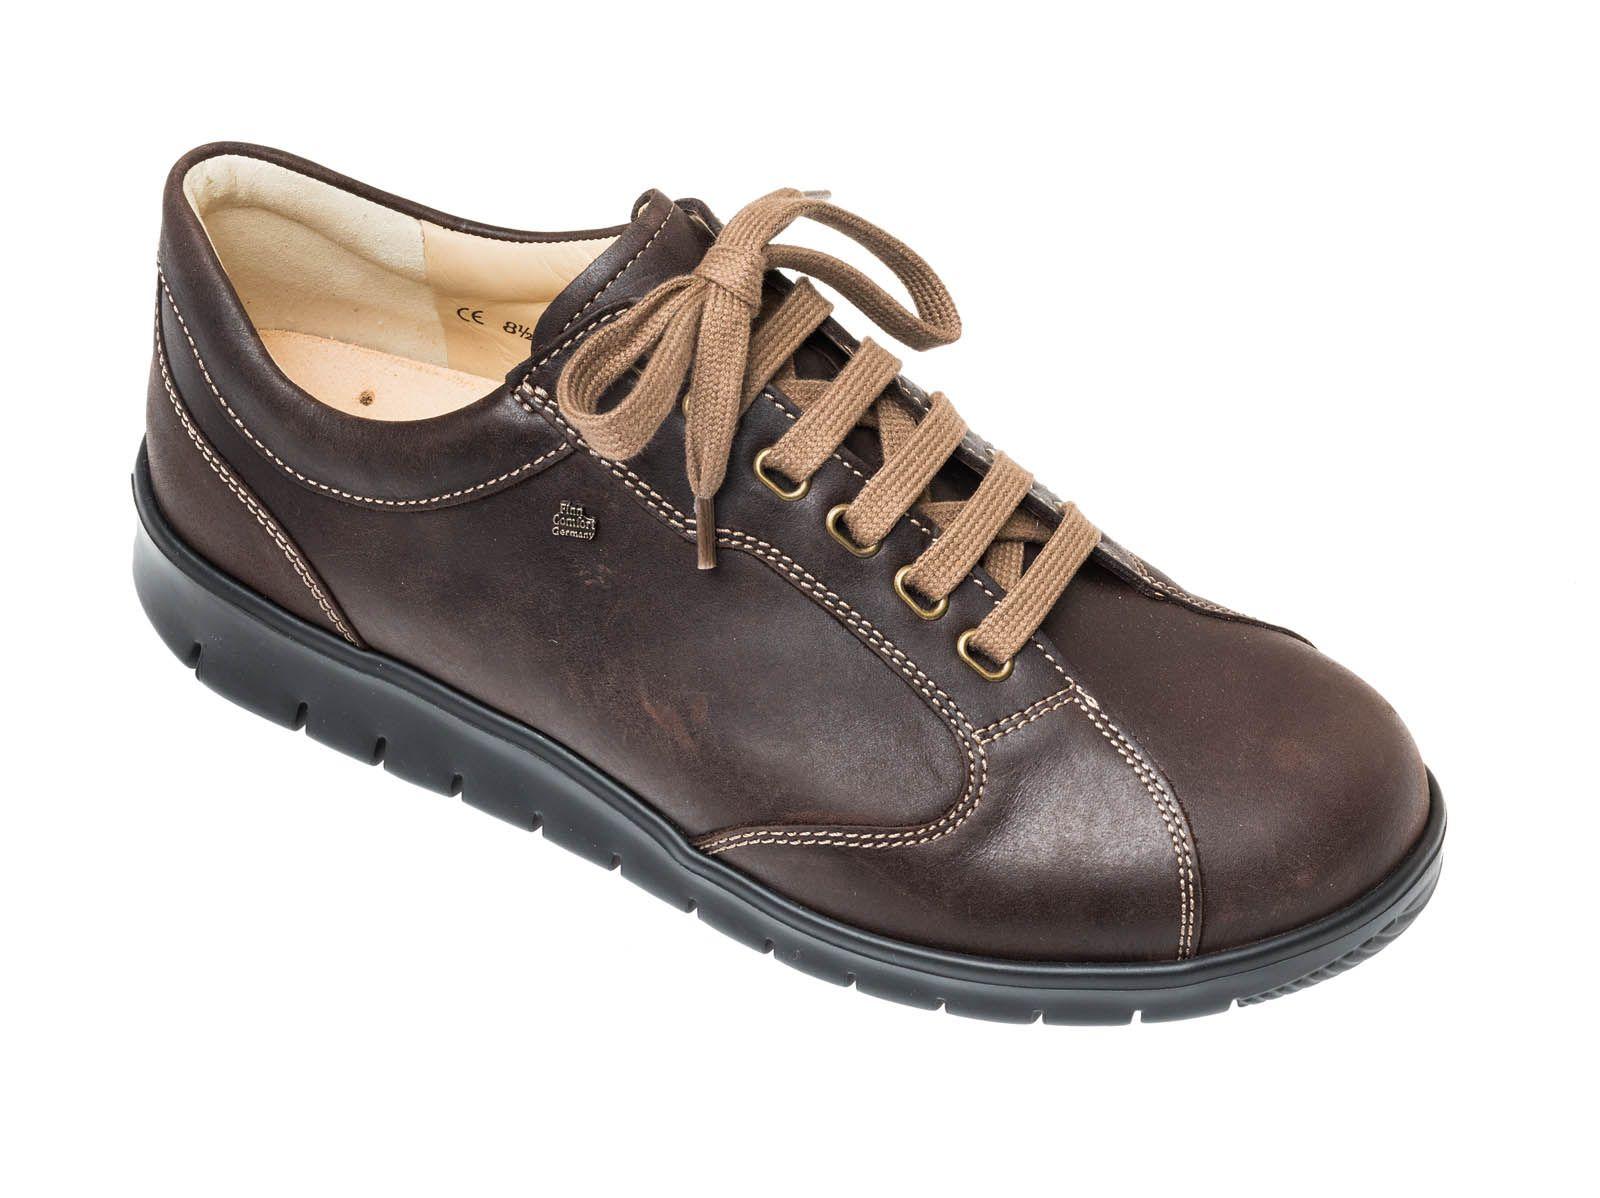 Finn Comfort Chennai Google Search Finn Comfort Shoes Sneakers